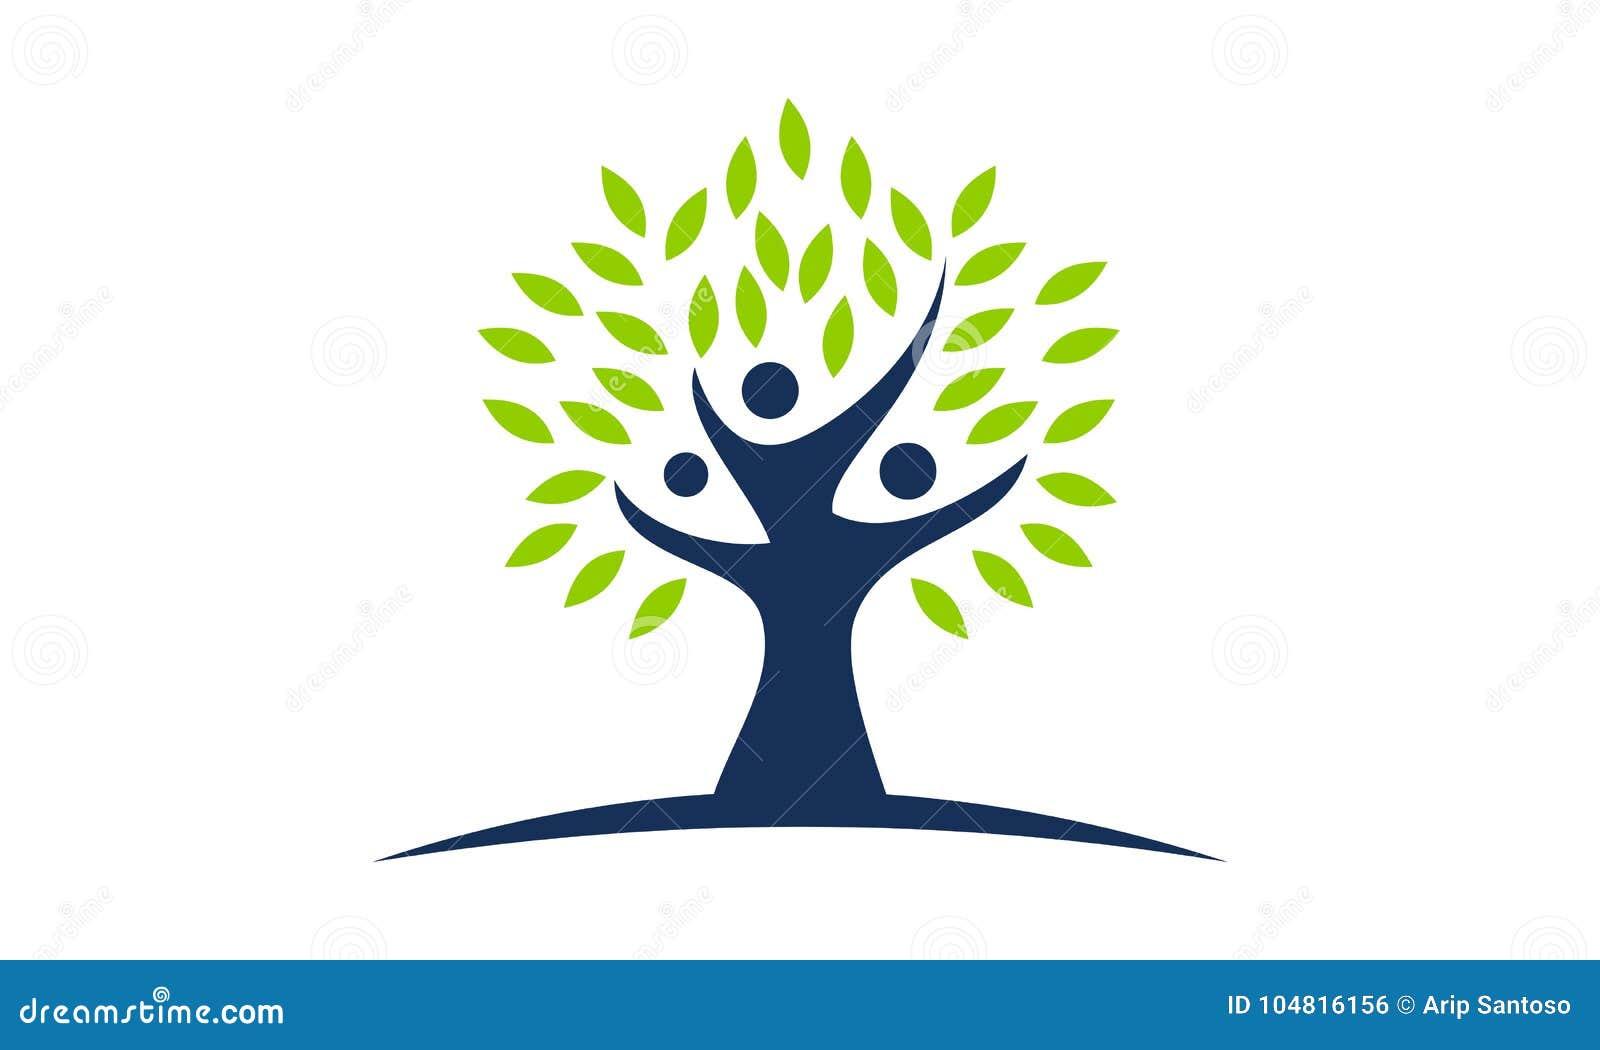 tree of life healing center stock vector illustration of community